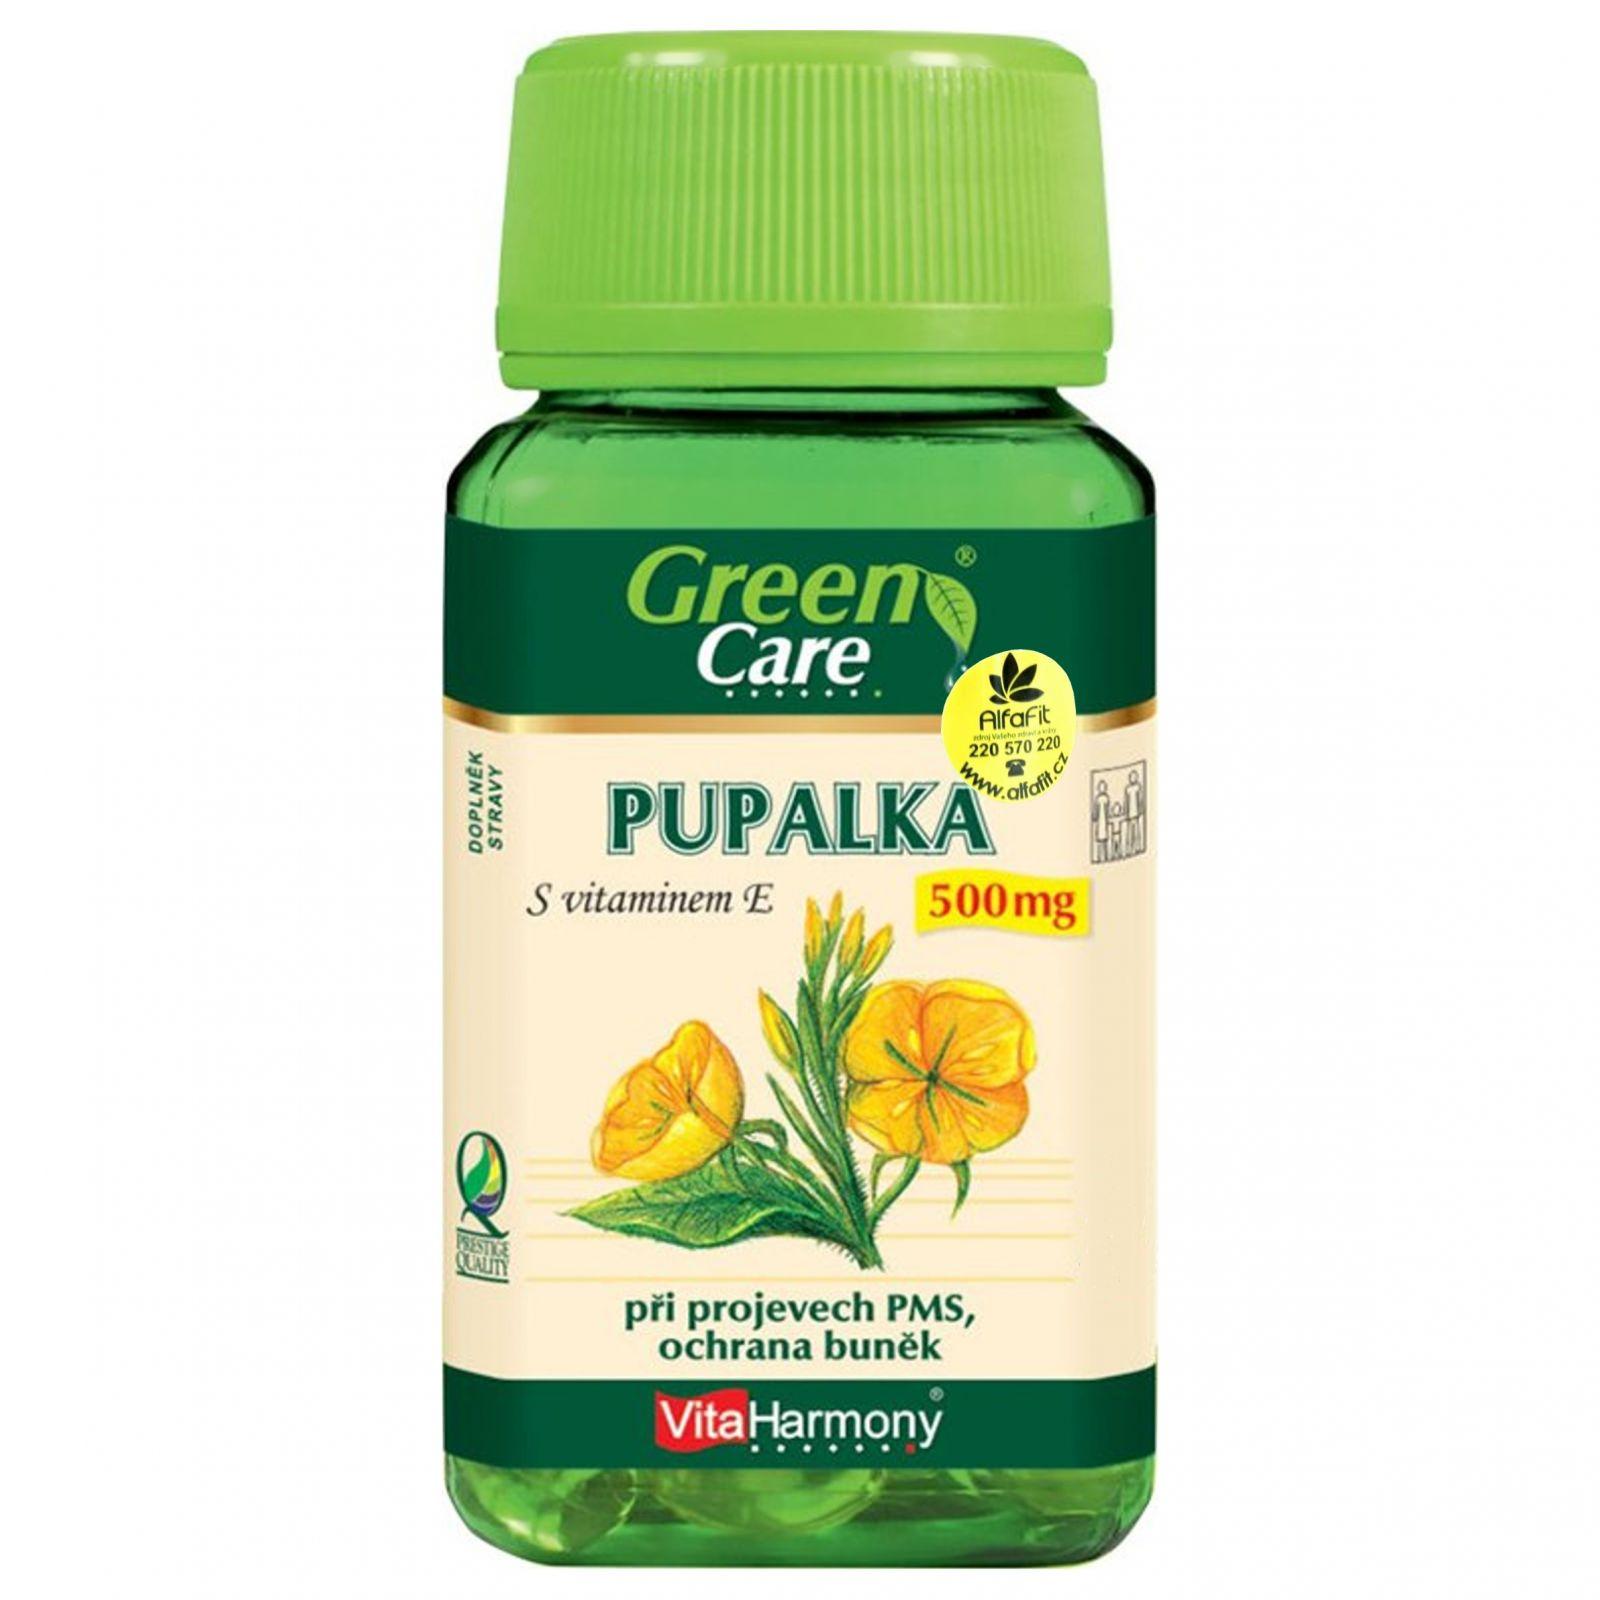 VitaHarmony Pupalka 500 mg - 90 tobolek